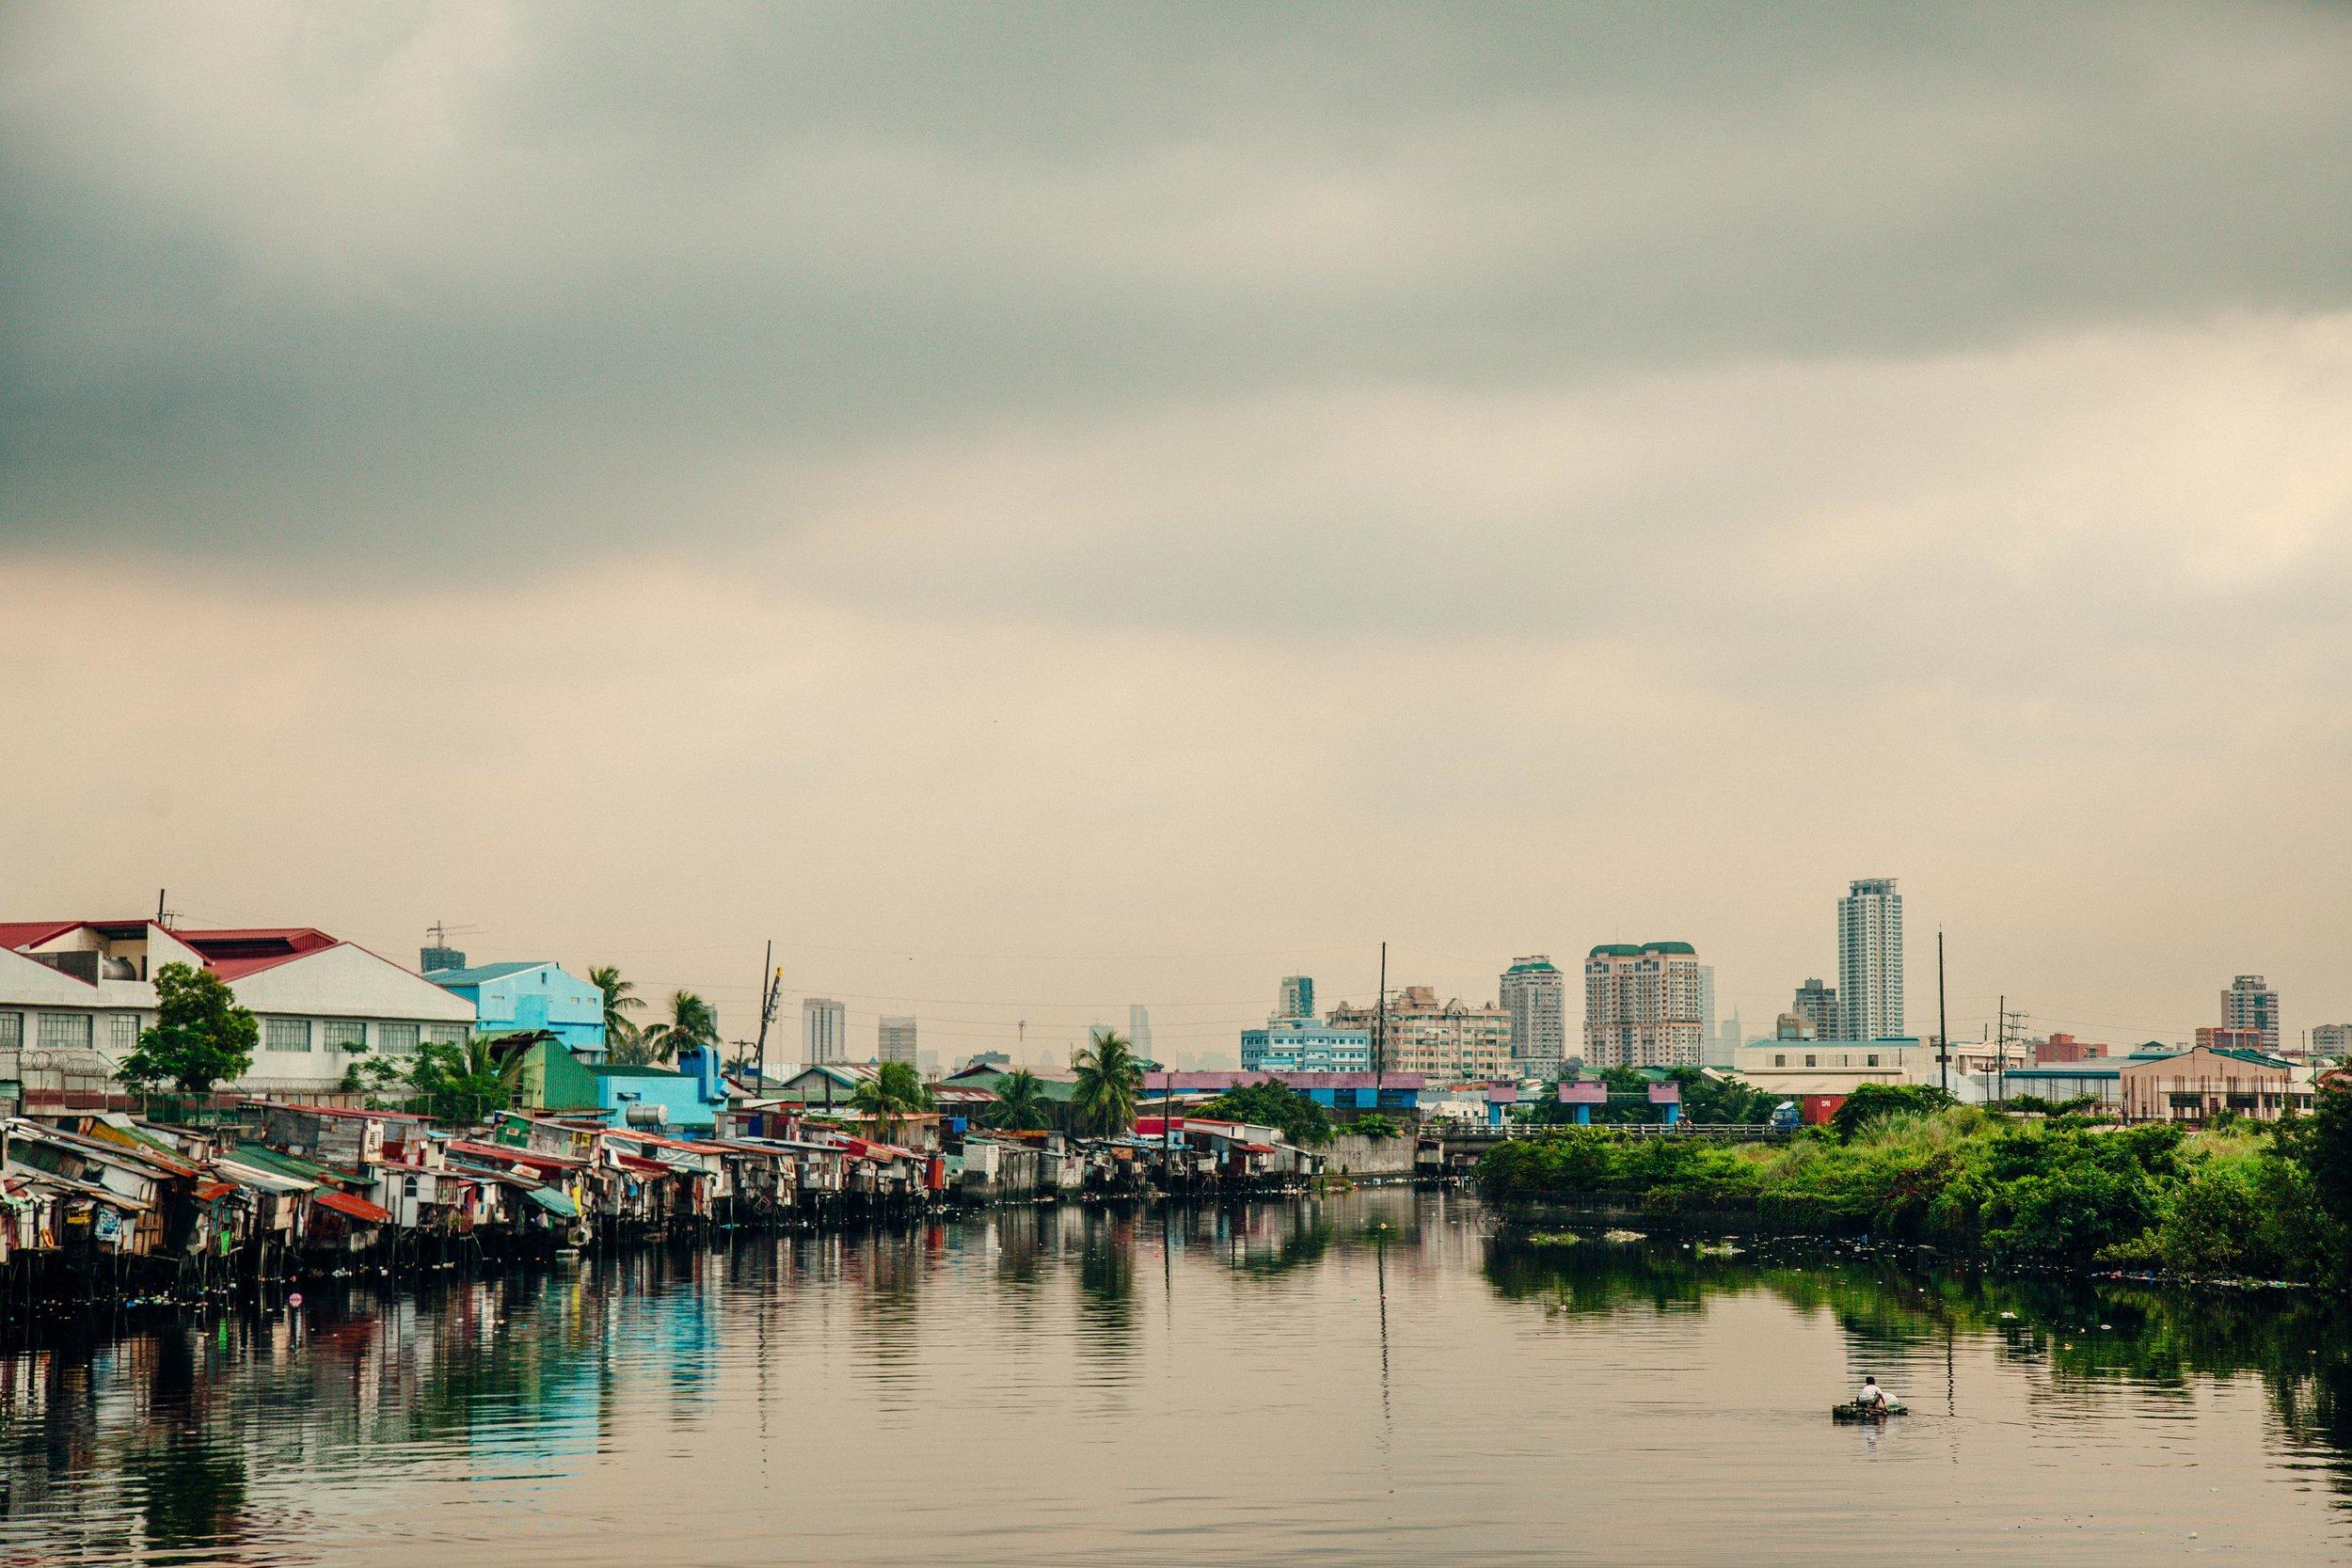 20121112_KU_Philippines_263.jpg